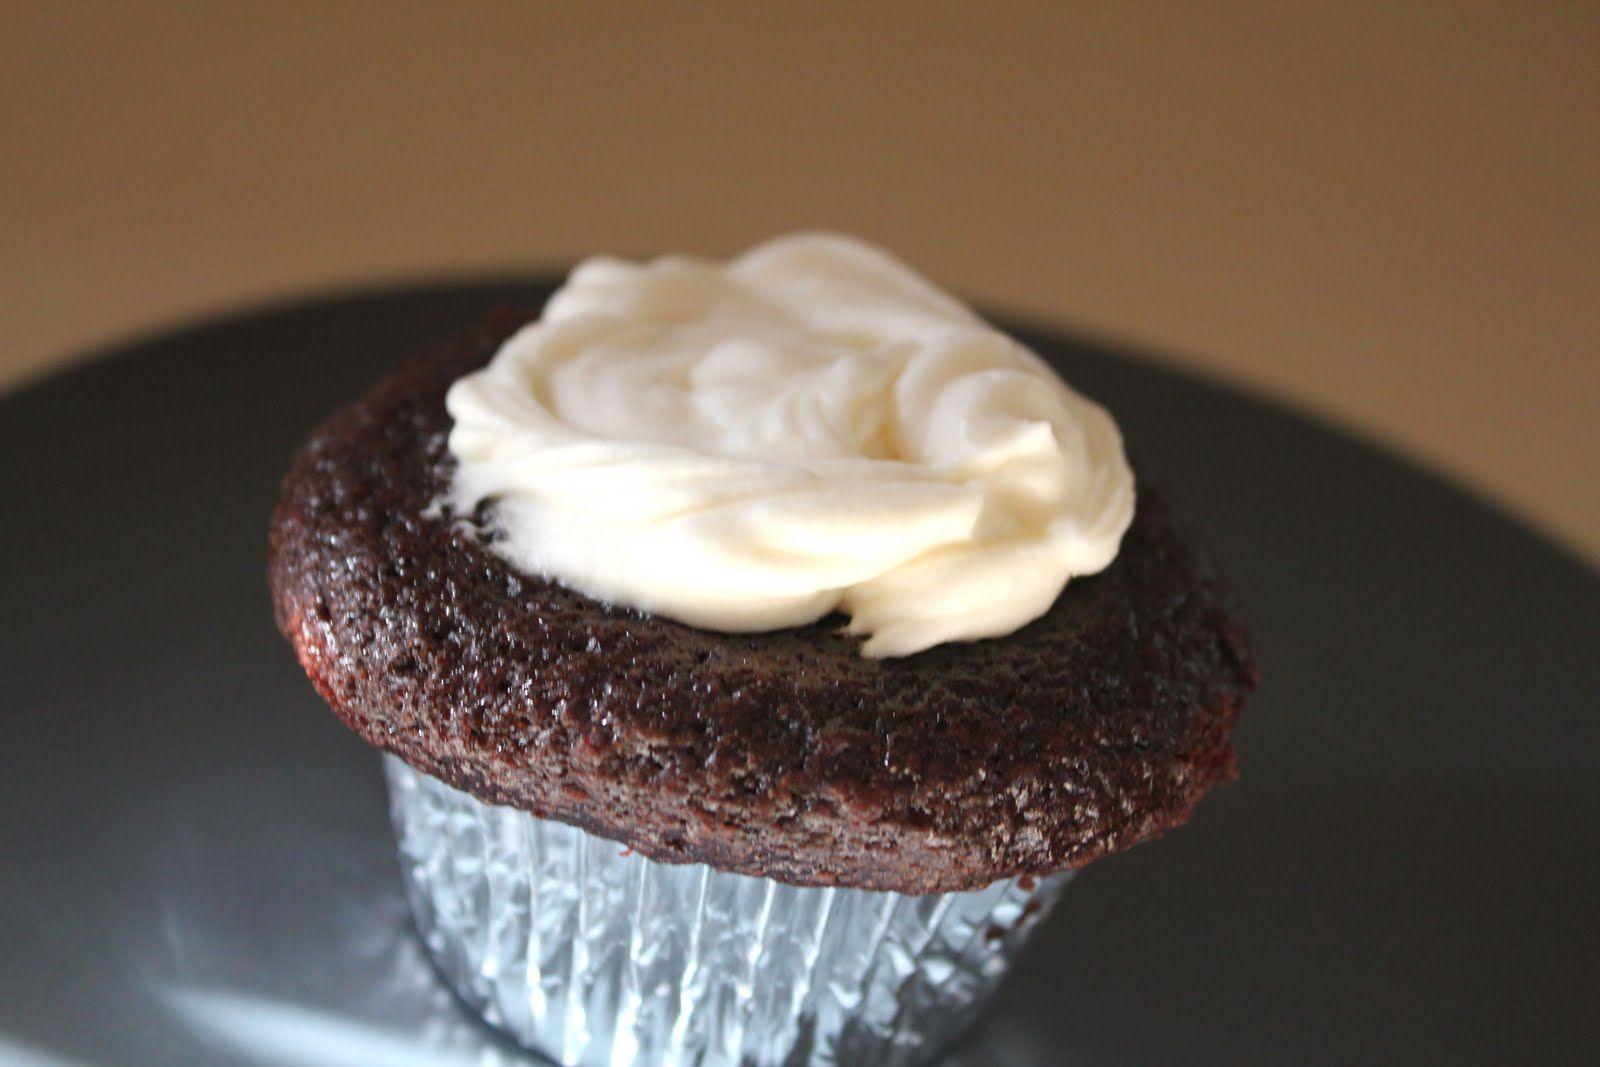 Sweet & Savory :: The Caramel Jar Blog: Recipe :: Perfect Chocolate Cupcakes!